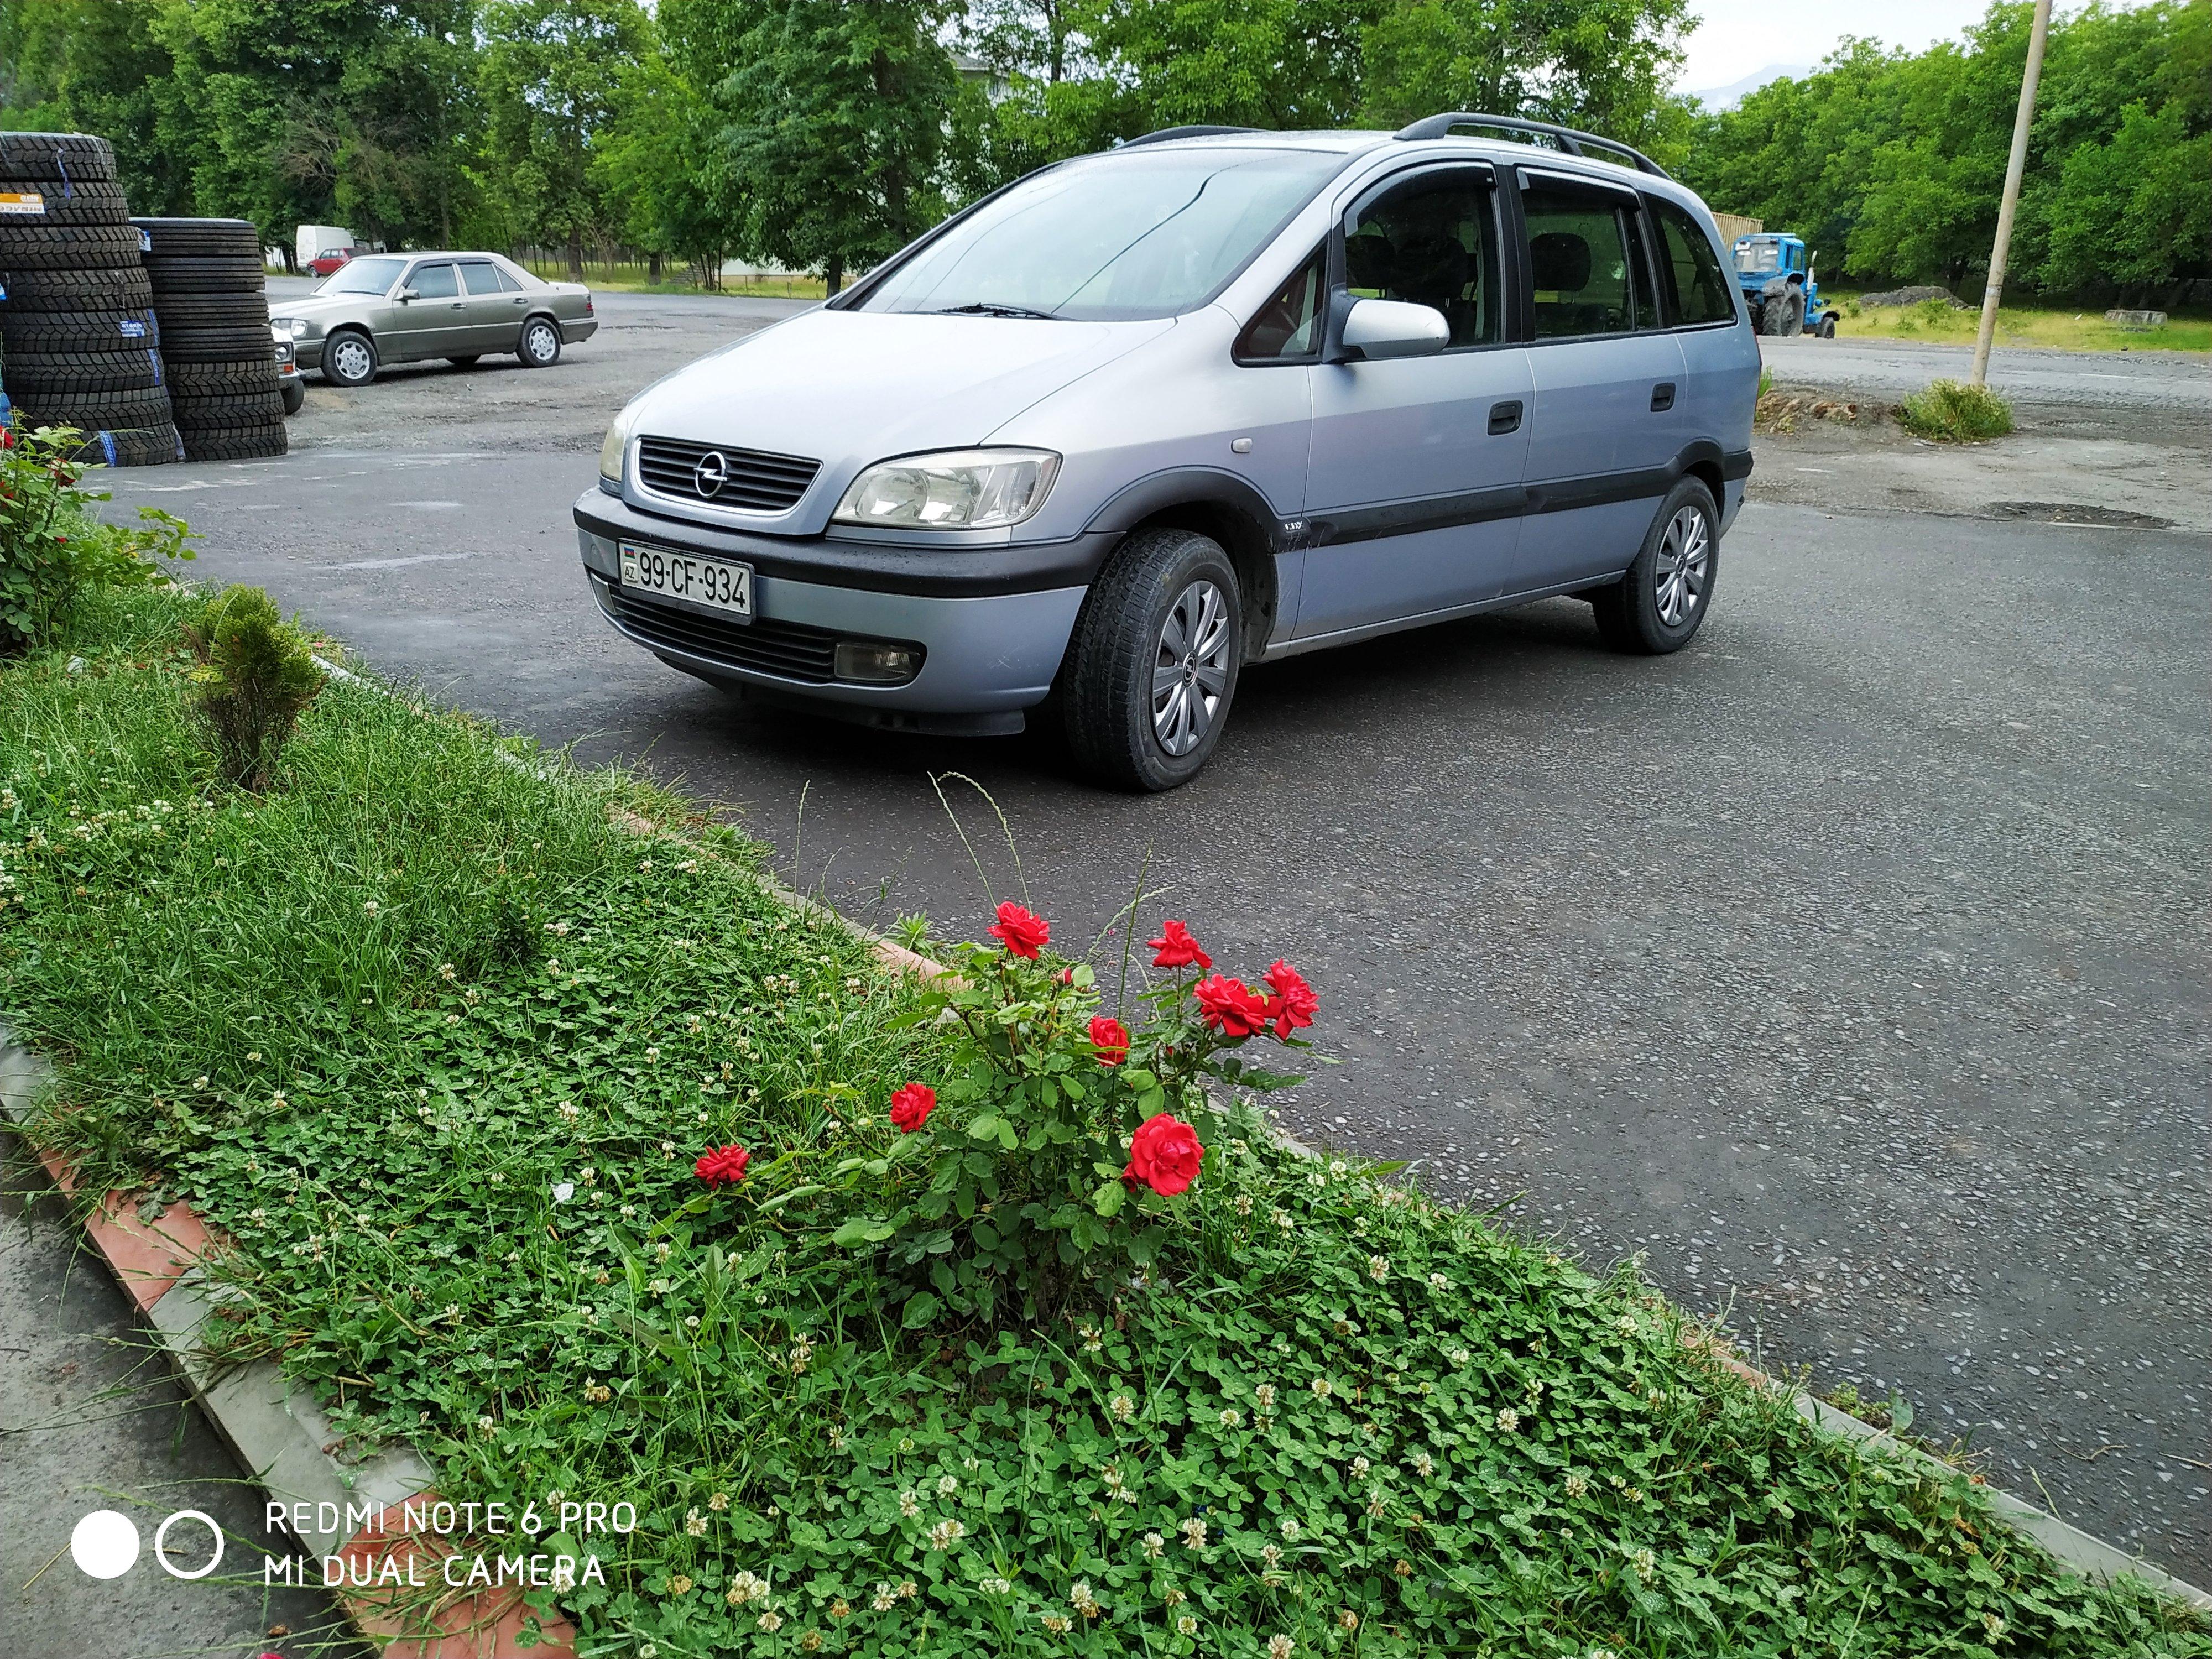 Opel Zafira 1800(lt) 1999 Подержанный  $10700